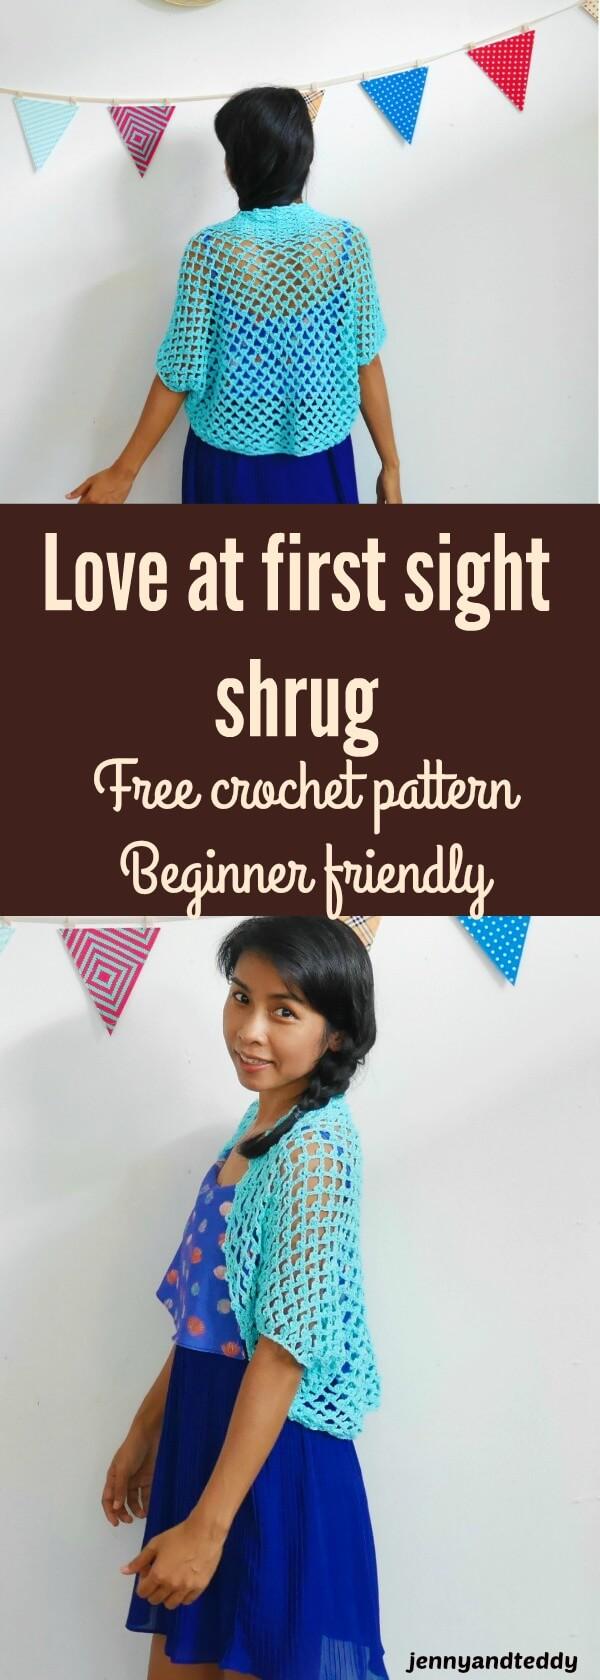 crochet shrug free pattern and tutorial